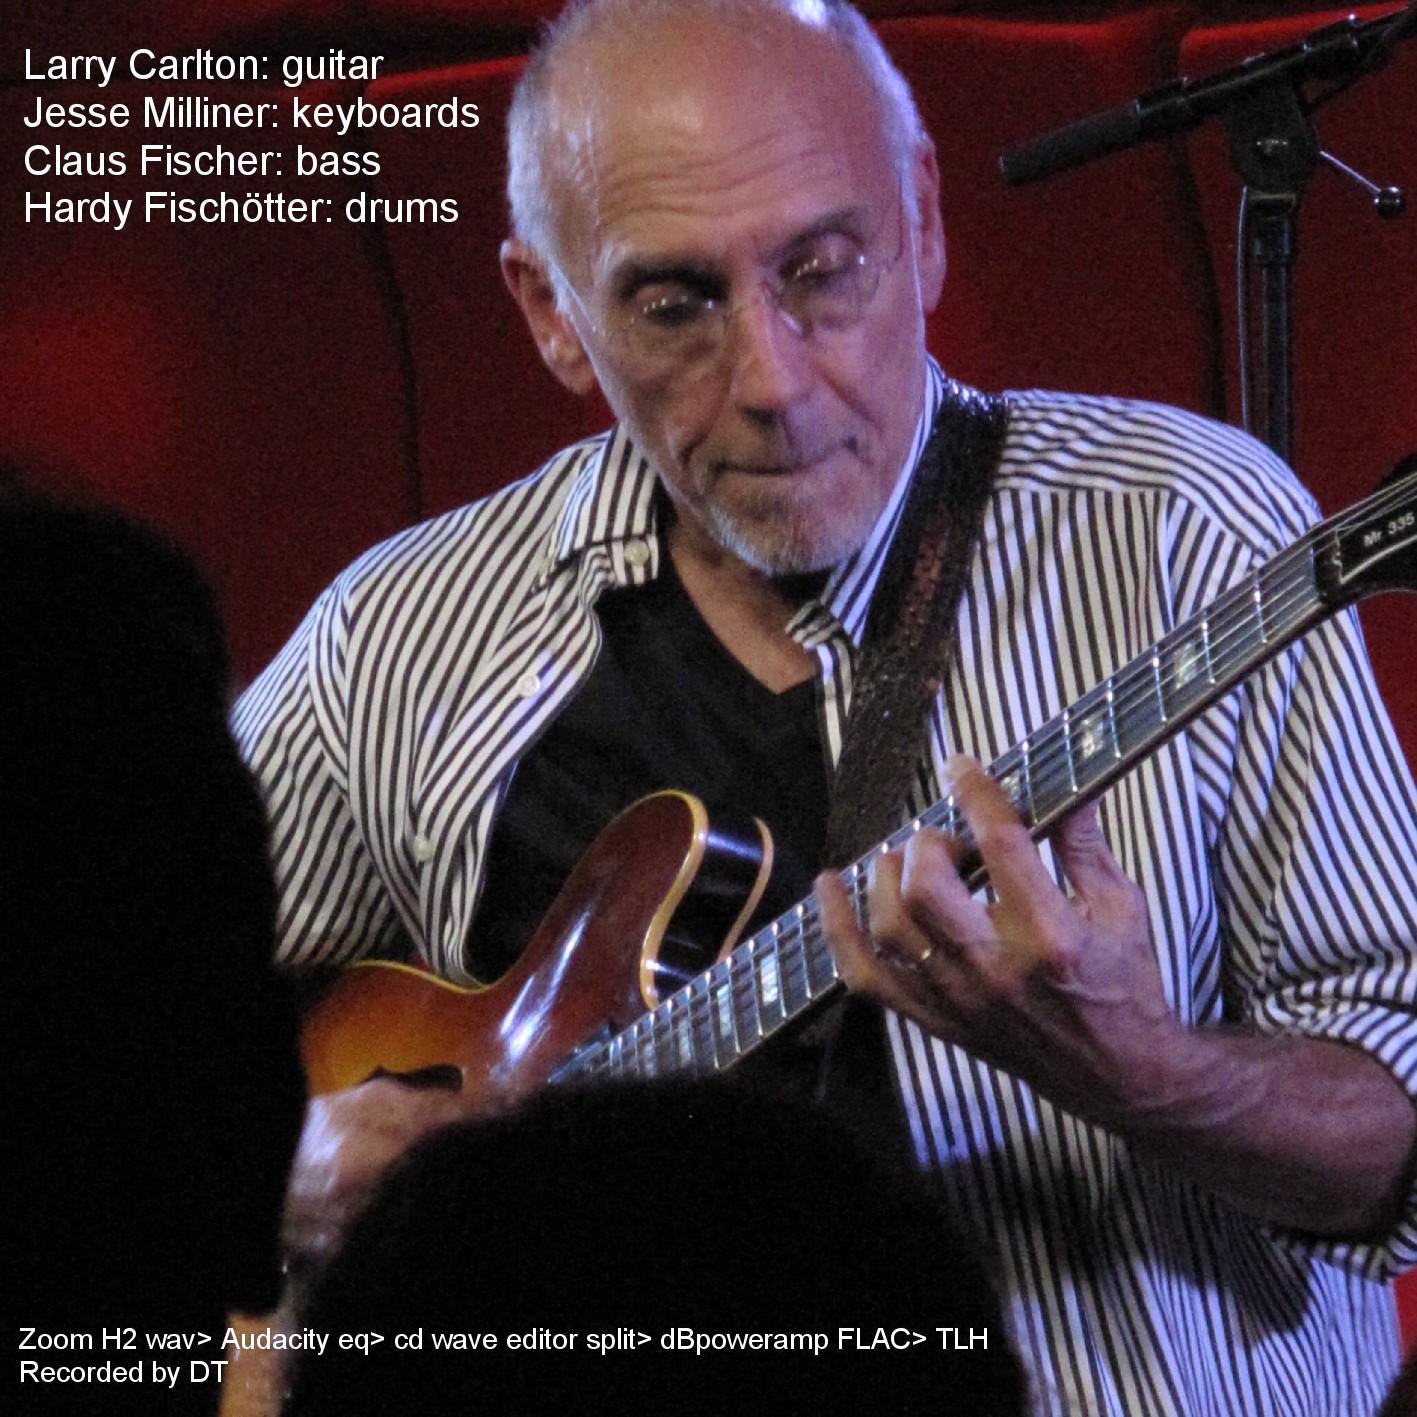 LarryCarltonQuartet2012-10-30NorthSeaJazzClubAmsterdamHolland.jpg